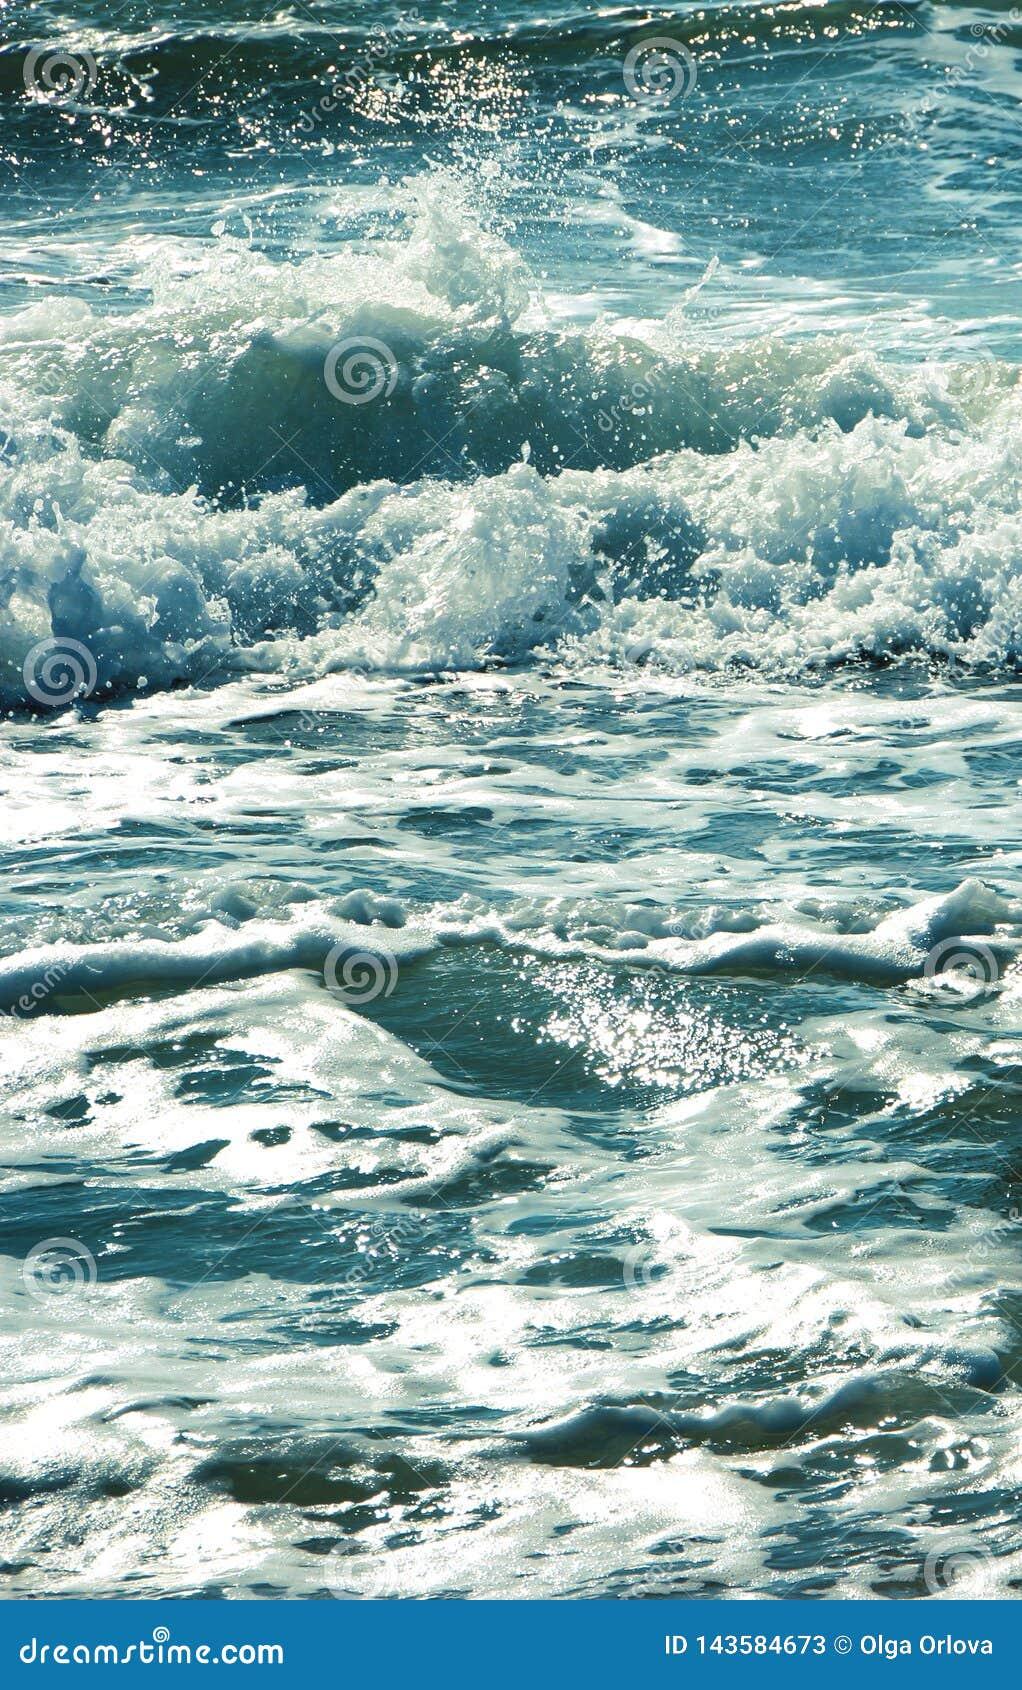 Sea wave splashing water.Blue blue photo.